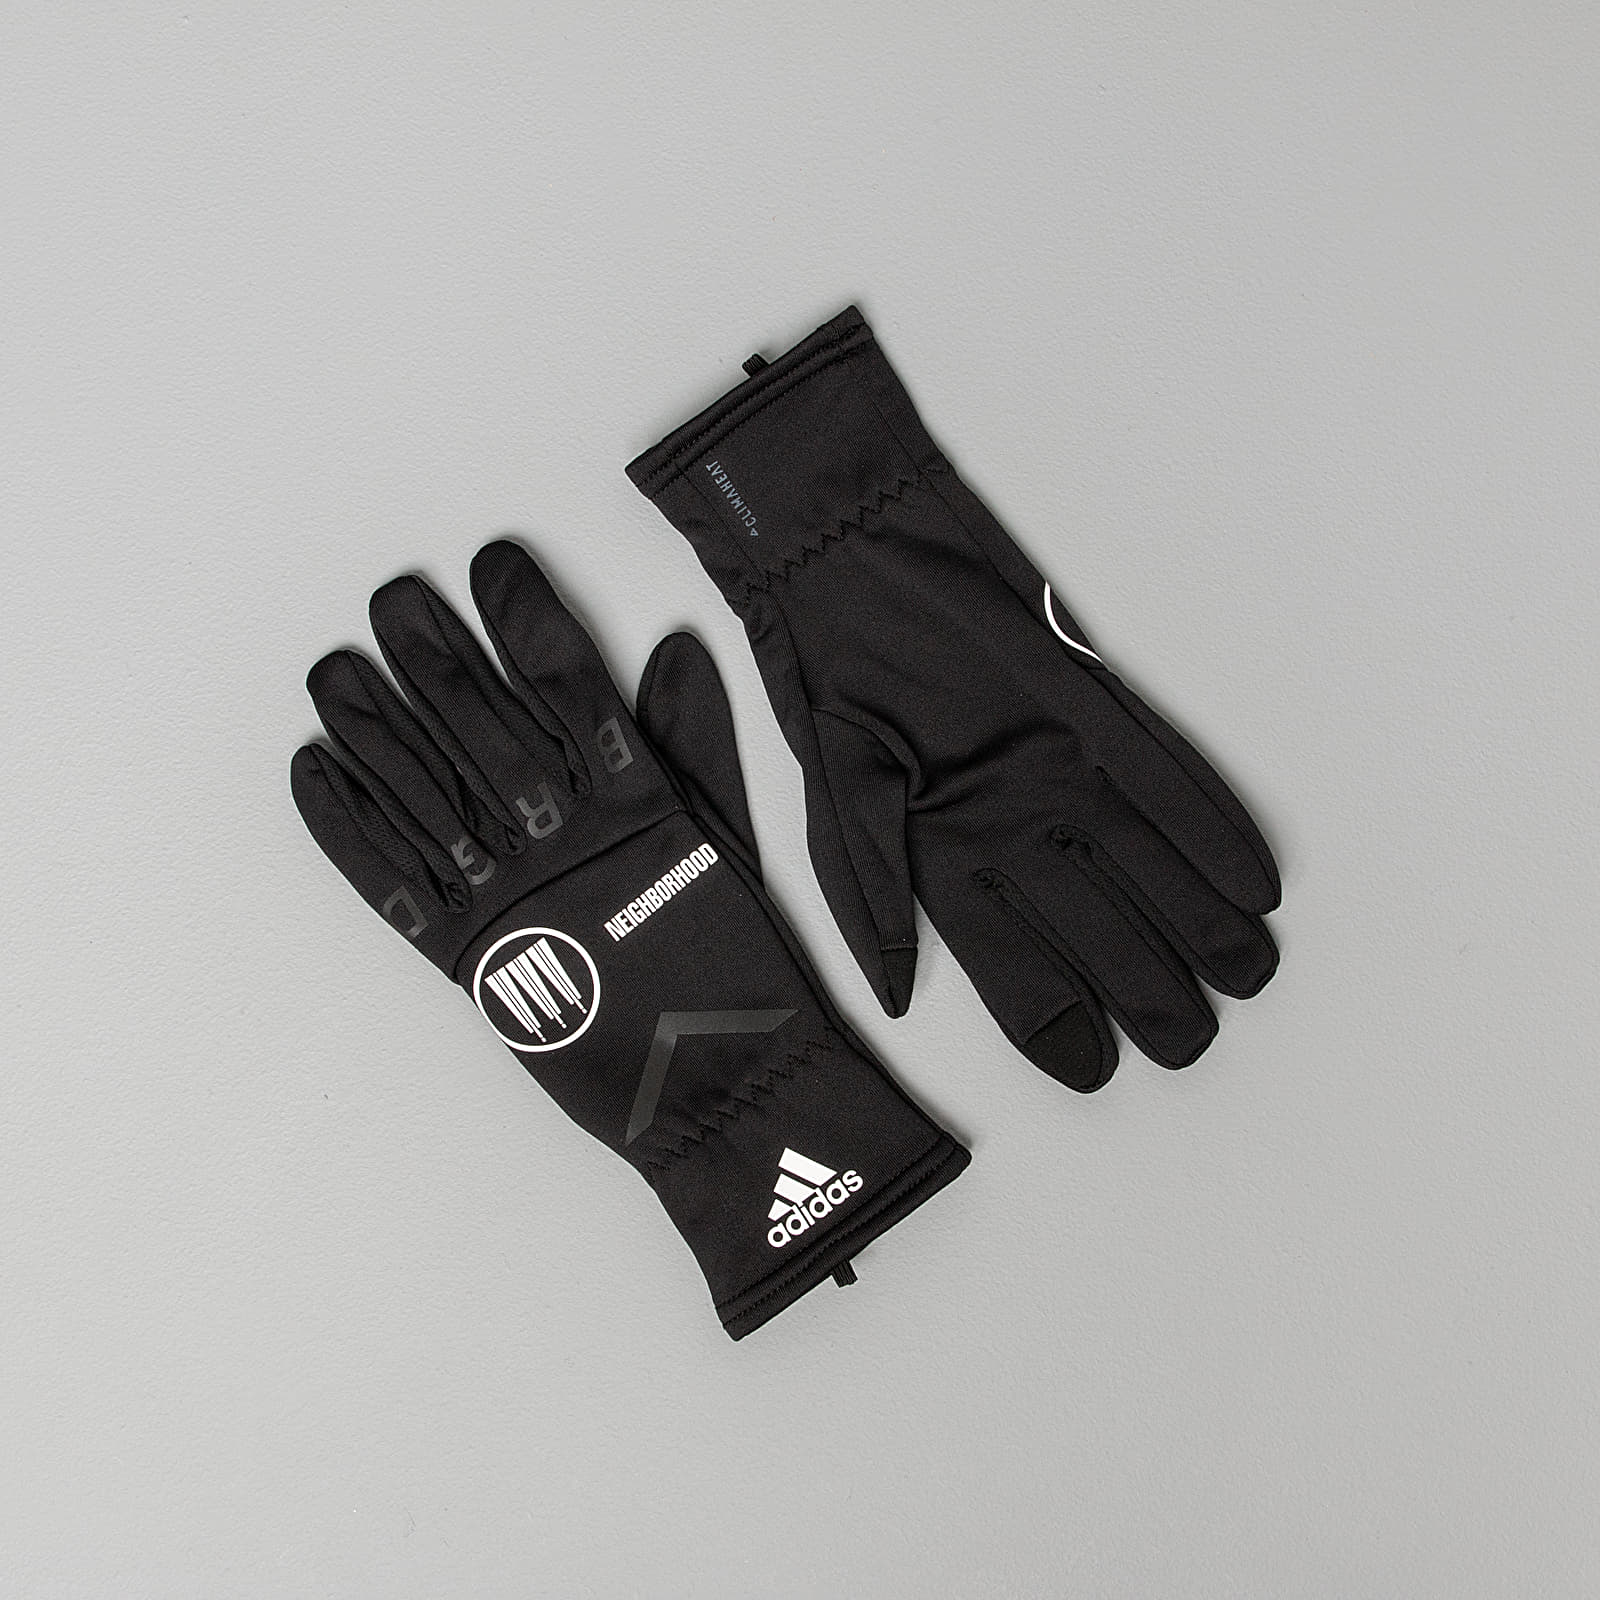 adidas x Neighborhood Gloves